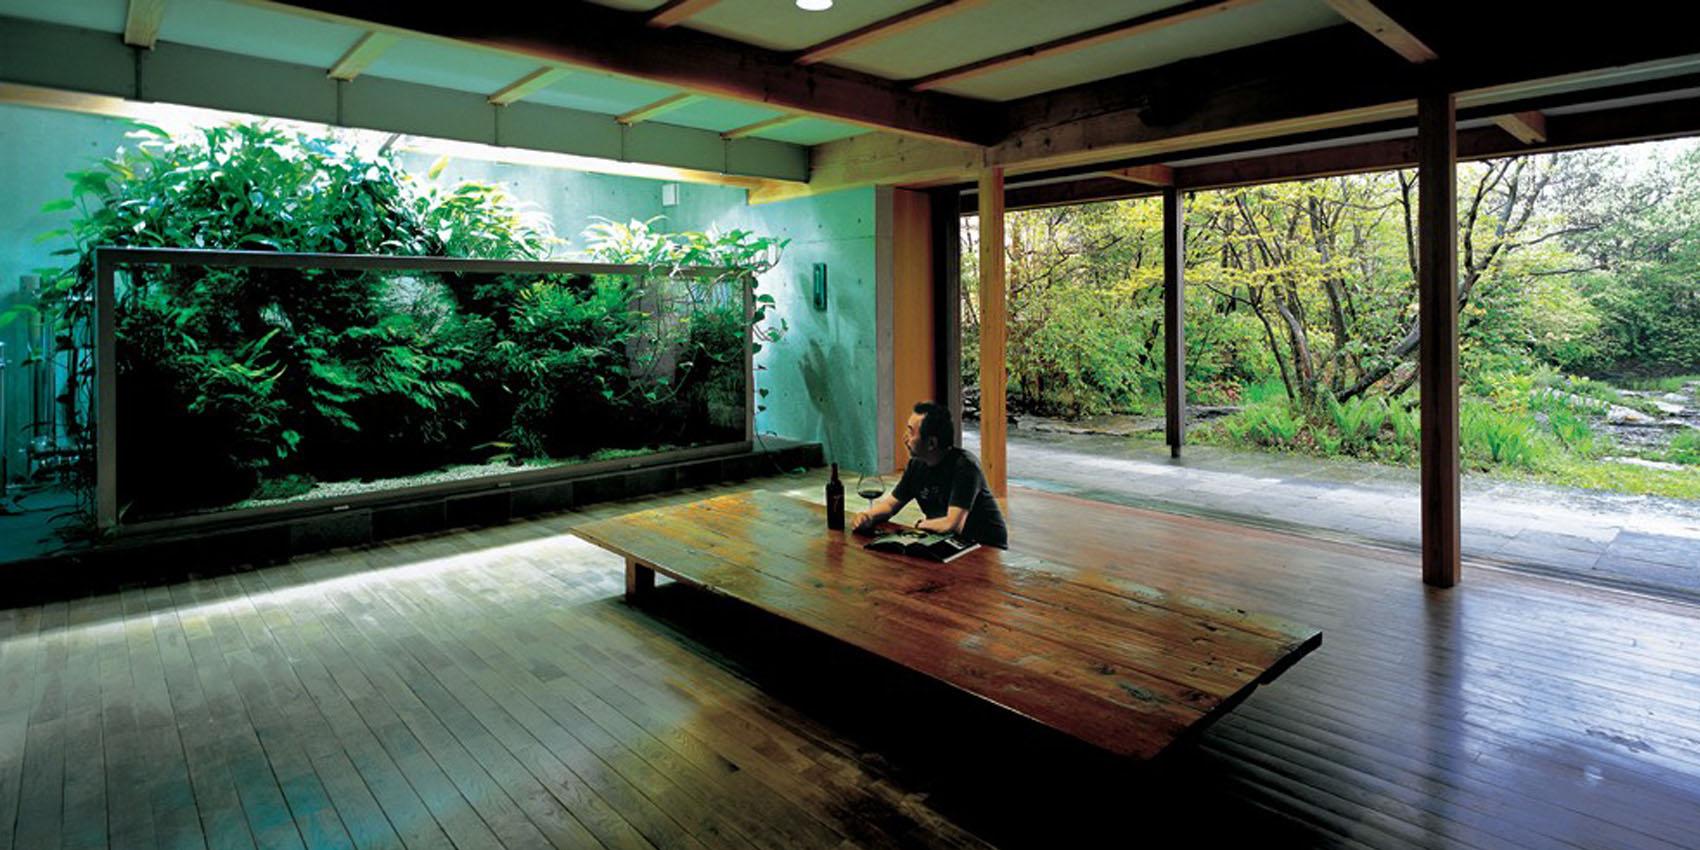 aquarium-architecture-takashi-amano-15.jpg